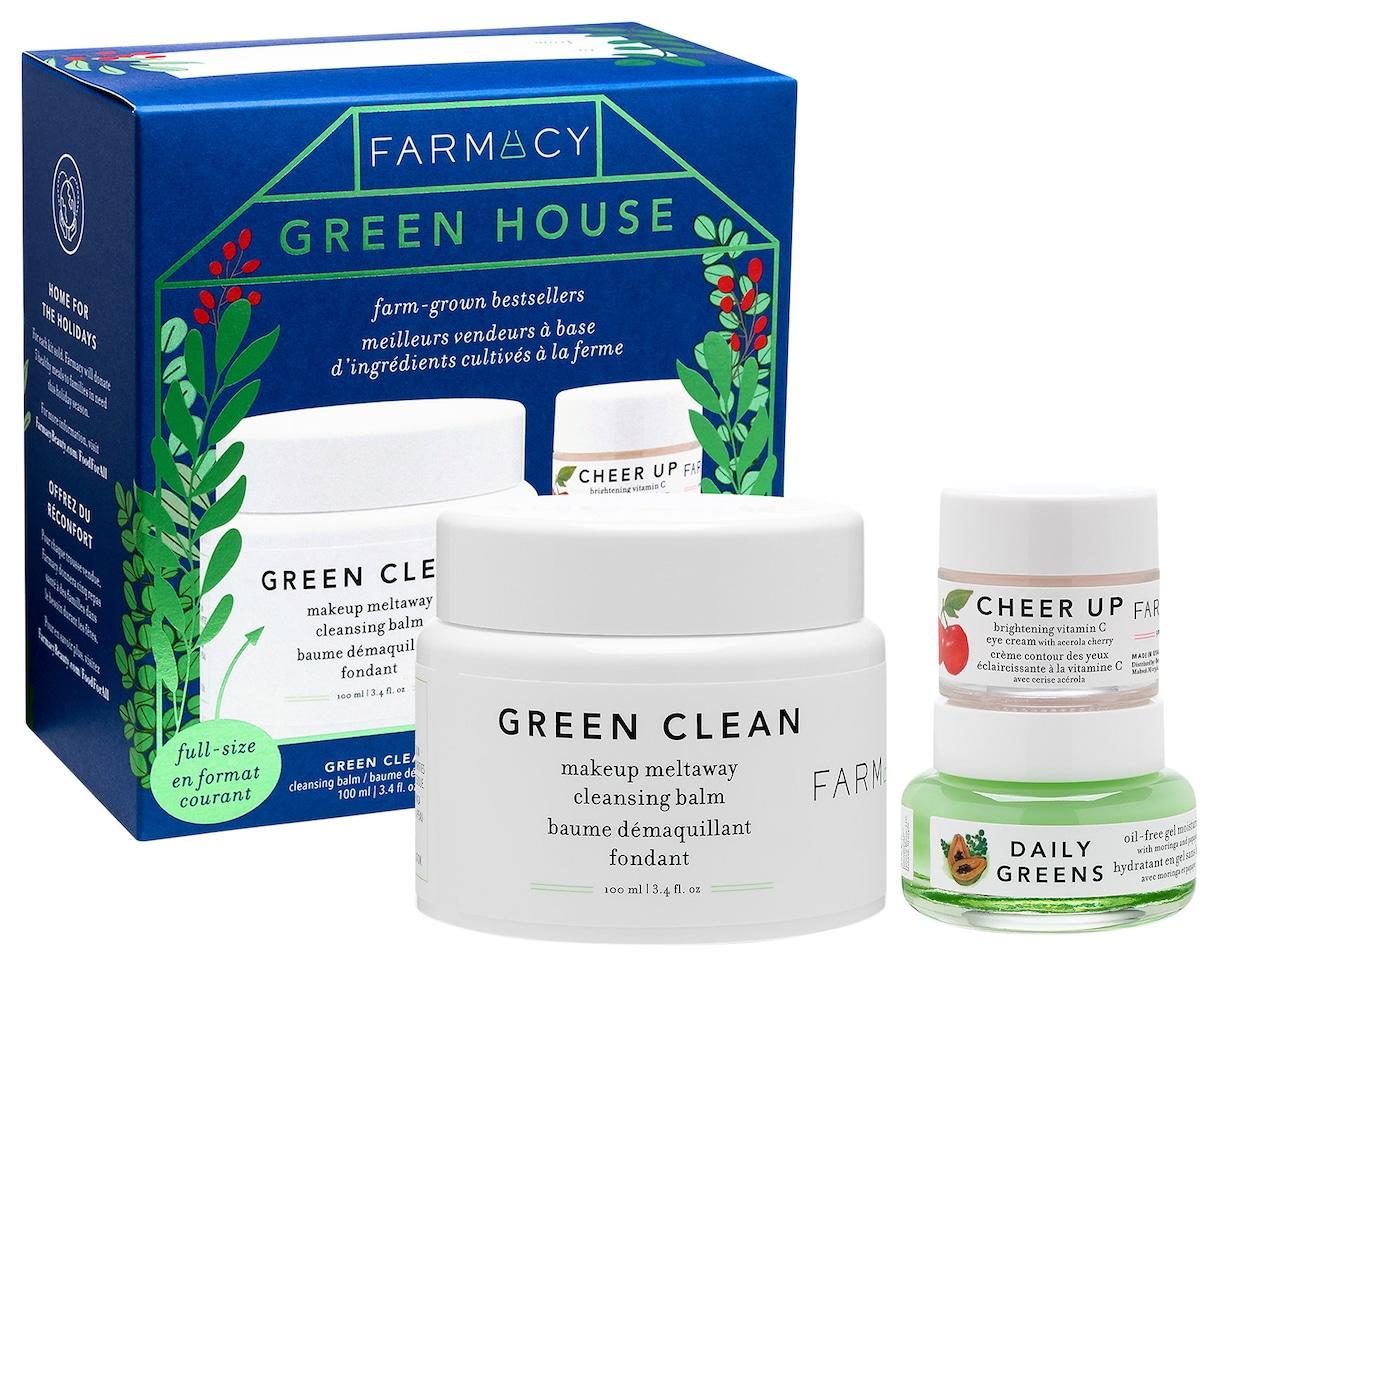 Farmacy Gift Set